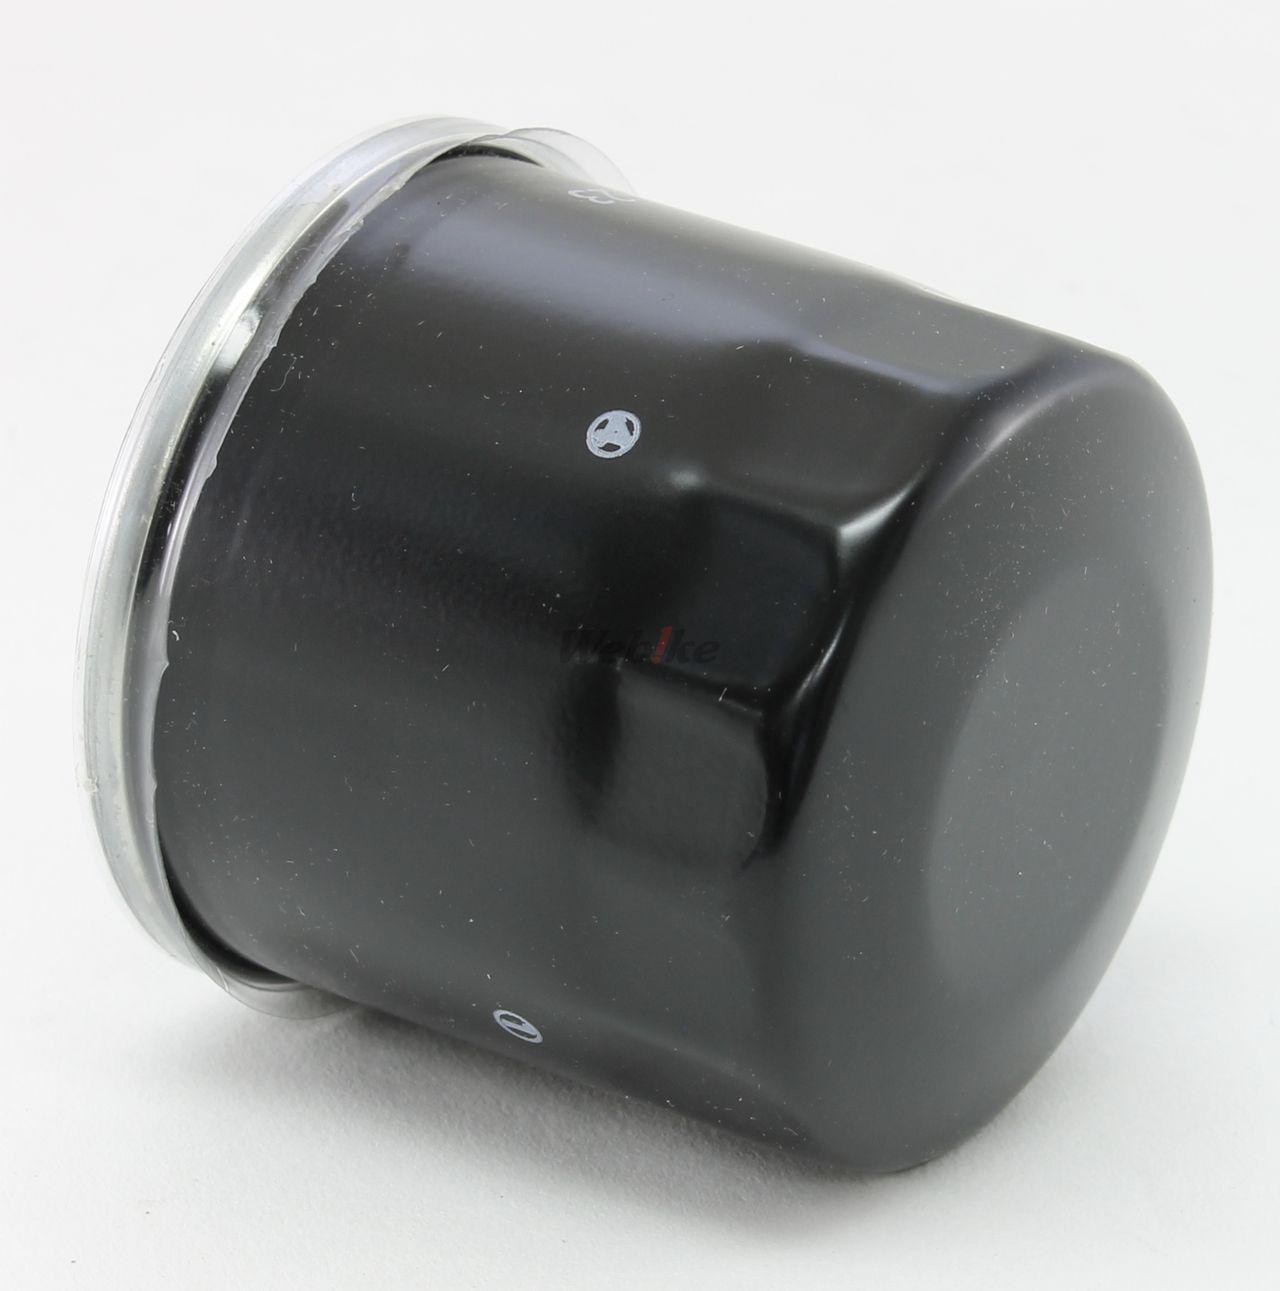 【KIJIMA】舊型機油濾芯(無磁鐵型式) - 「Webike-摩托百貨」